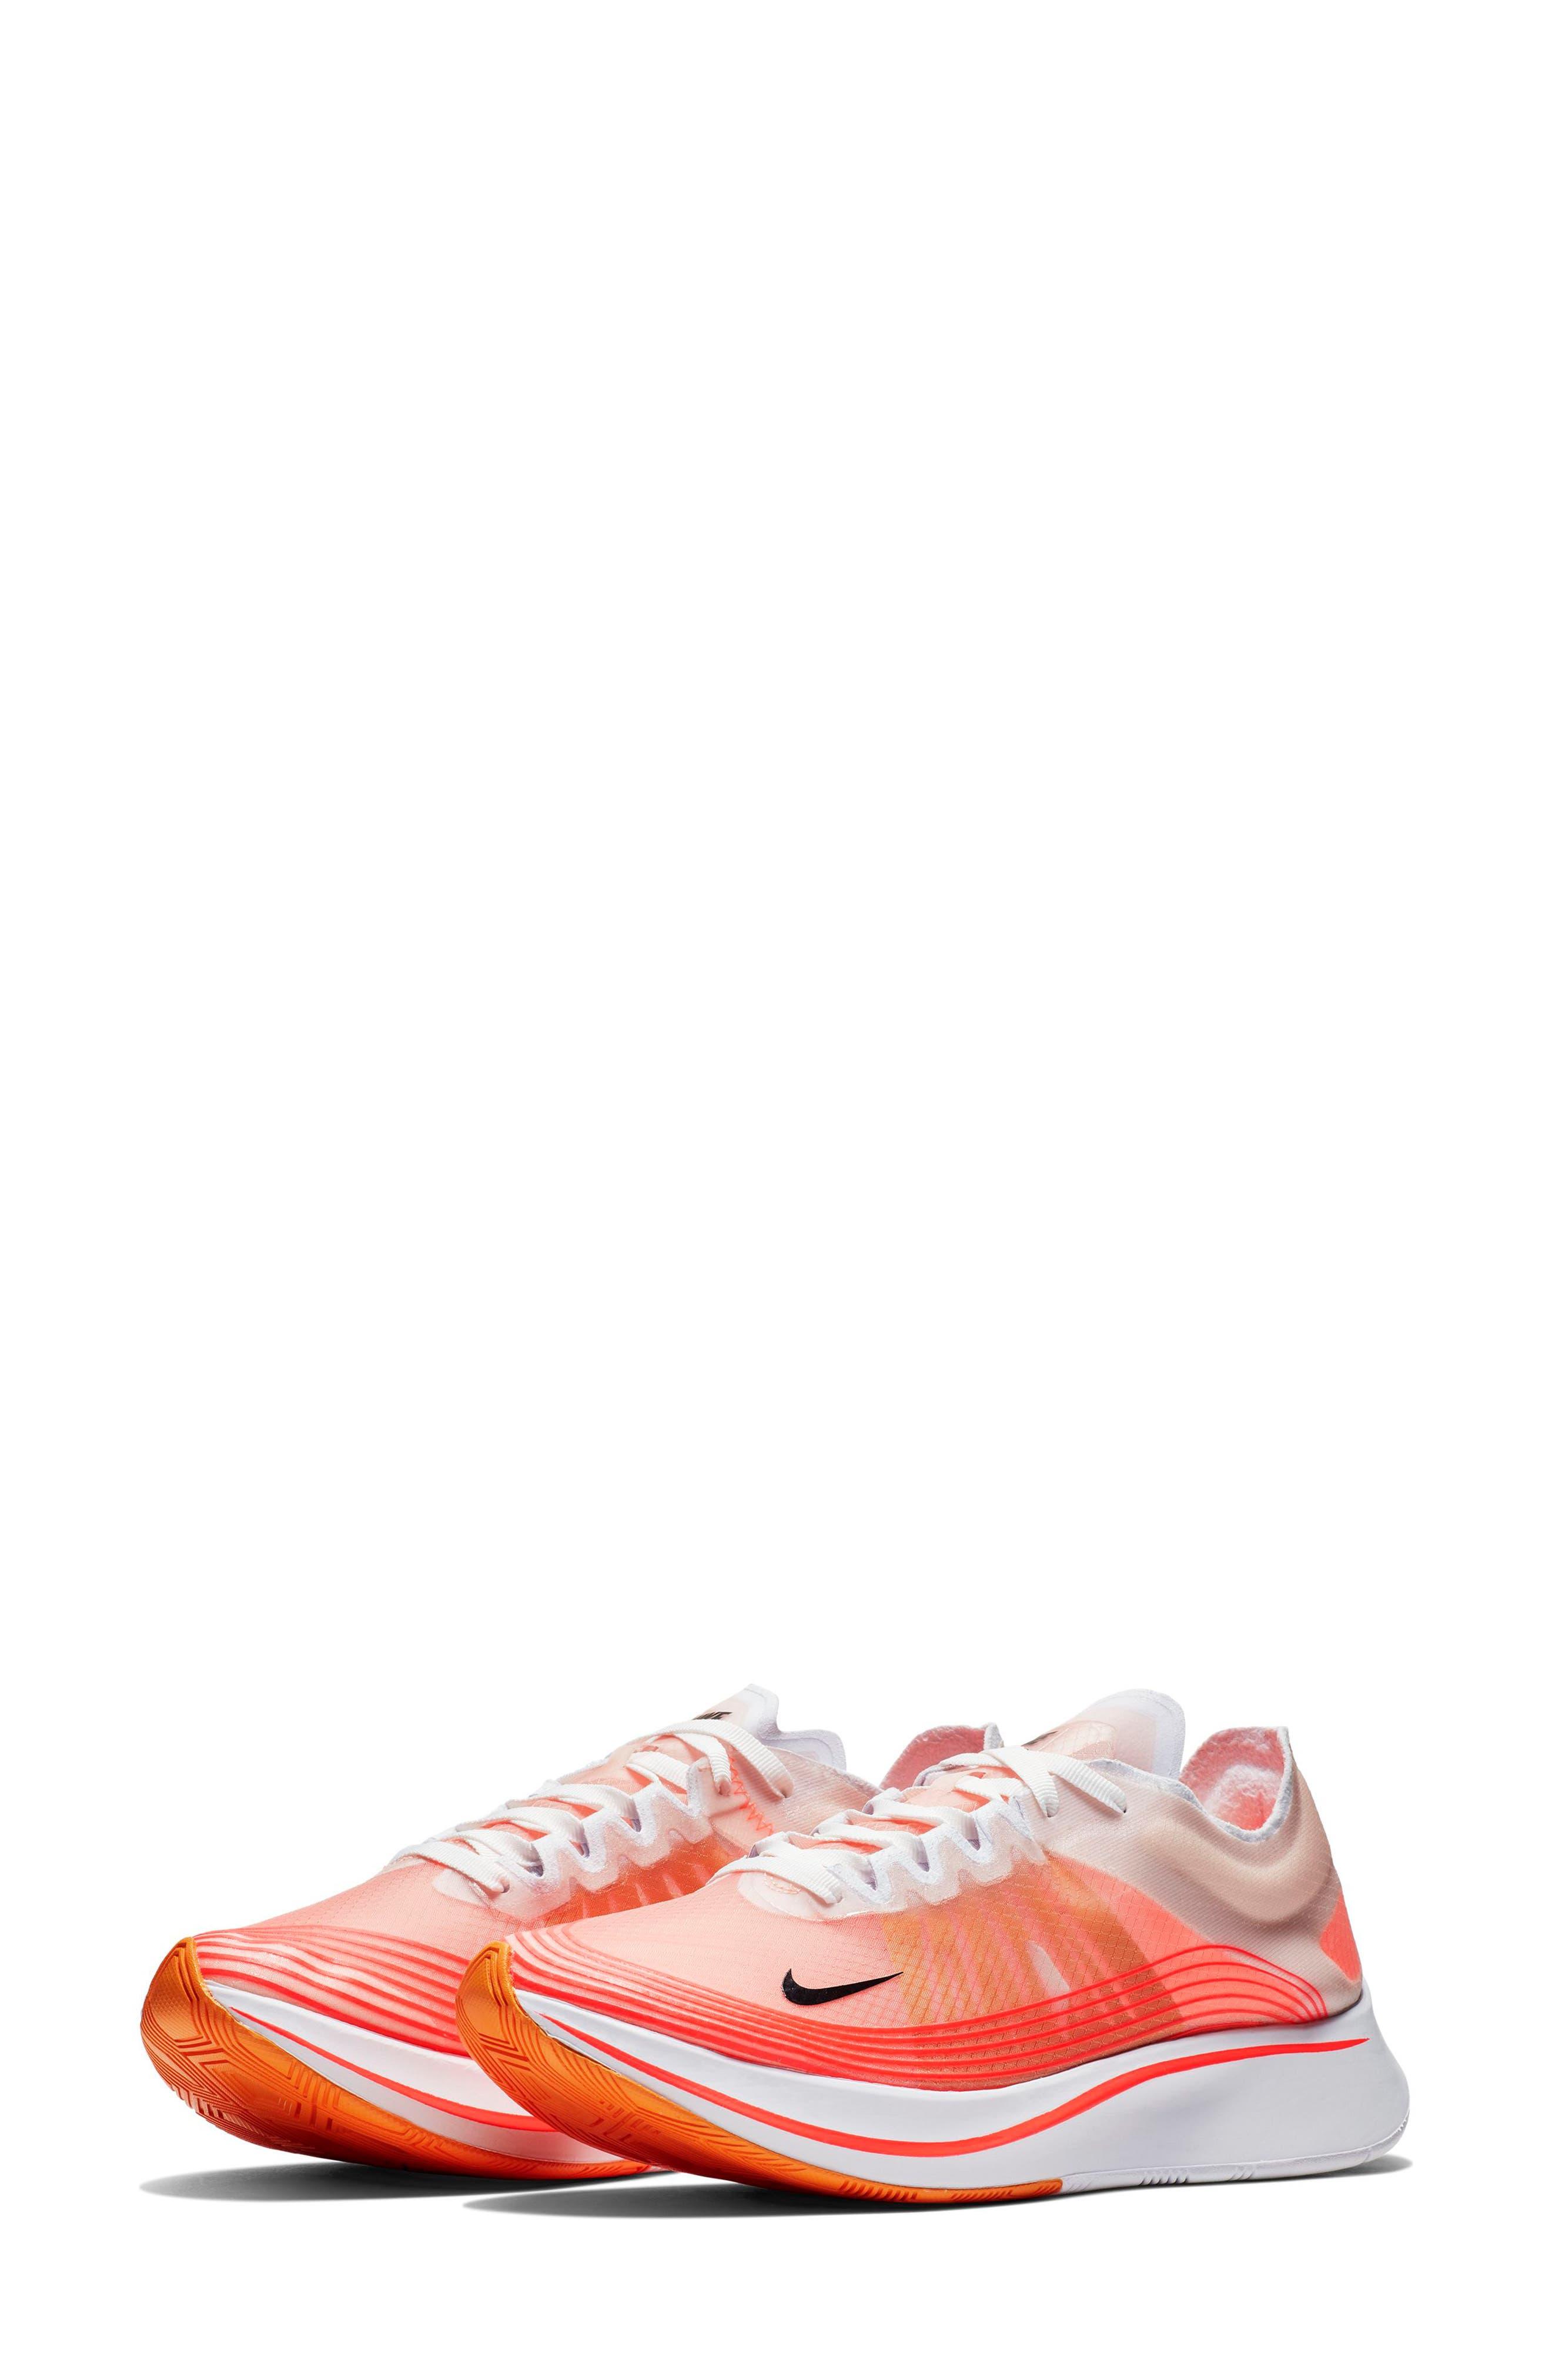 Zoom Fly SP Running Shoe,                             Main thumbnail 1, color,                             VARSITY RED/ BLACK/ WHITE